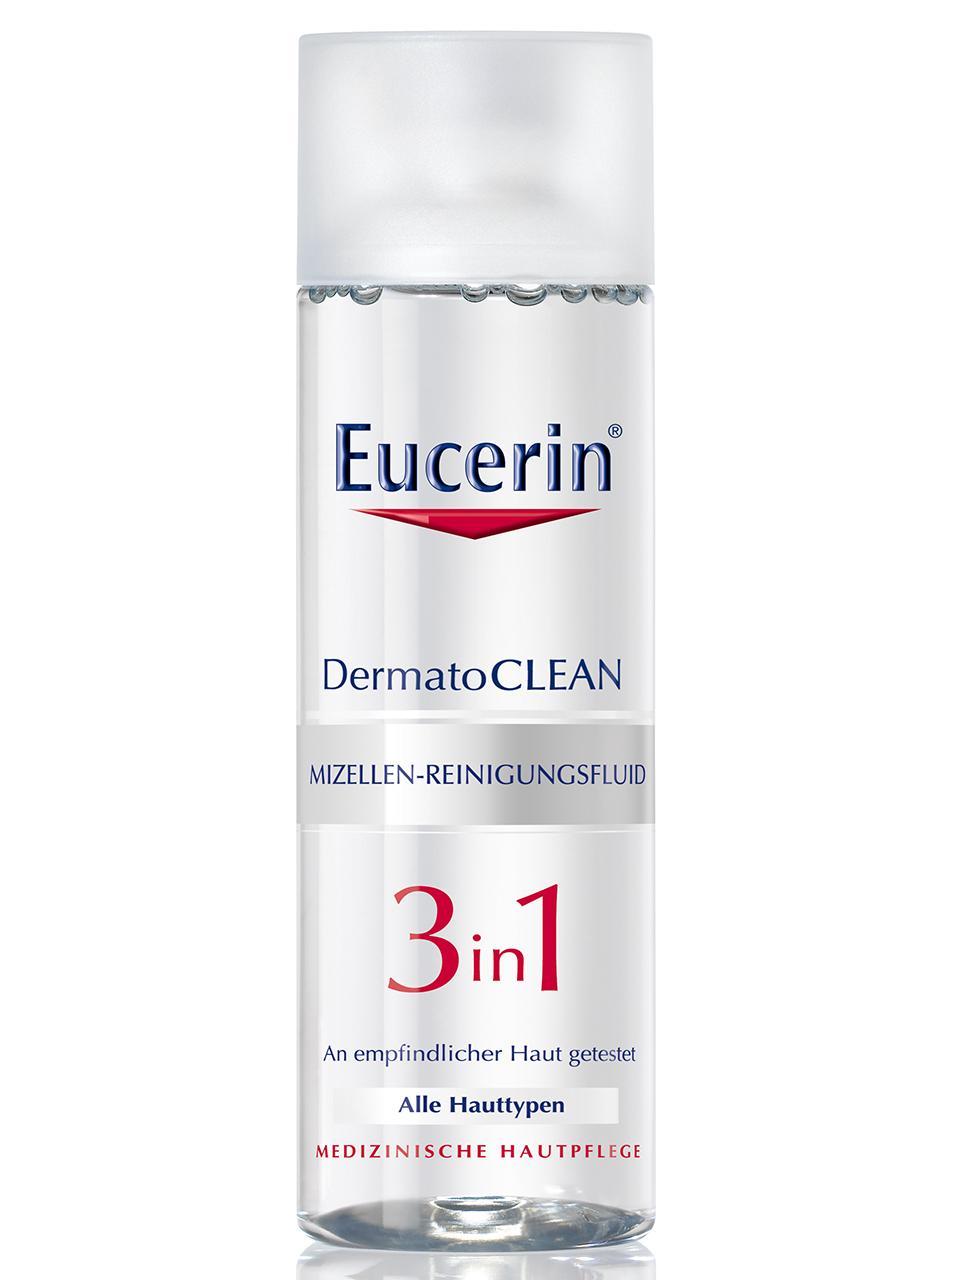 Eucerin DermatoClean 3in1 Mizellen Reinigungsfluid